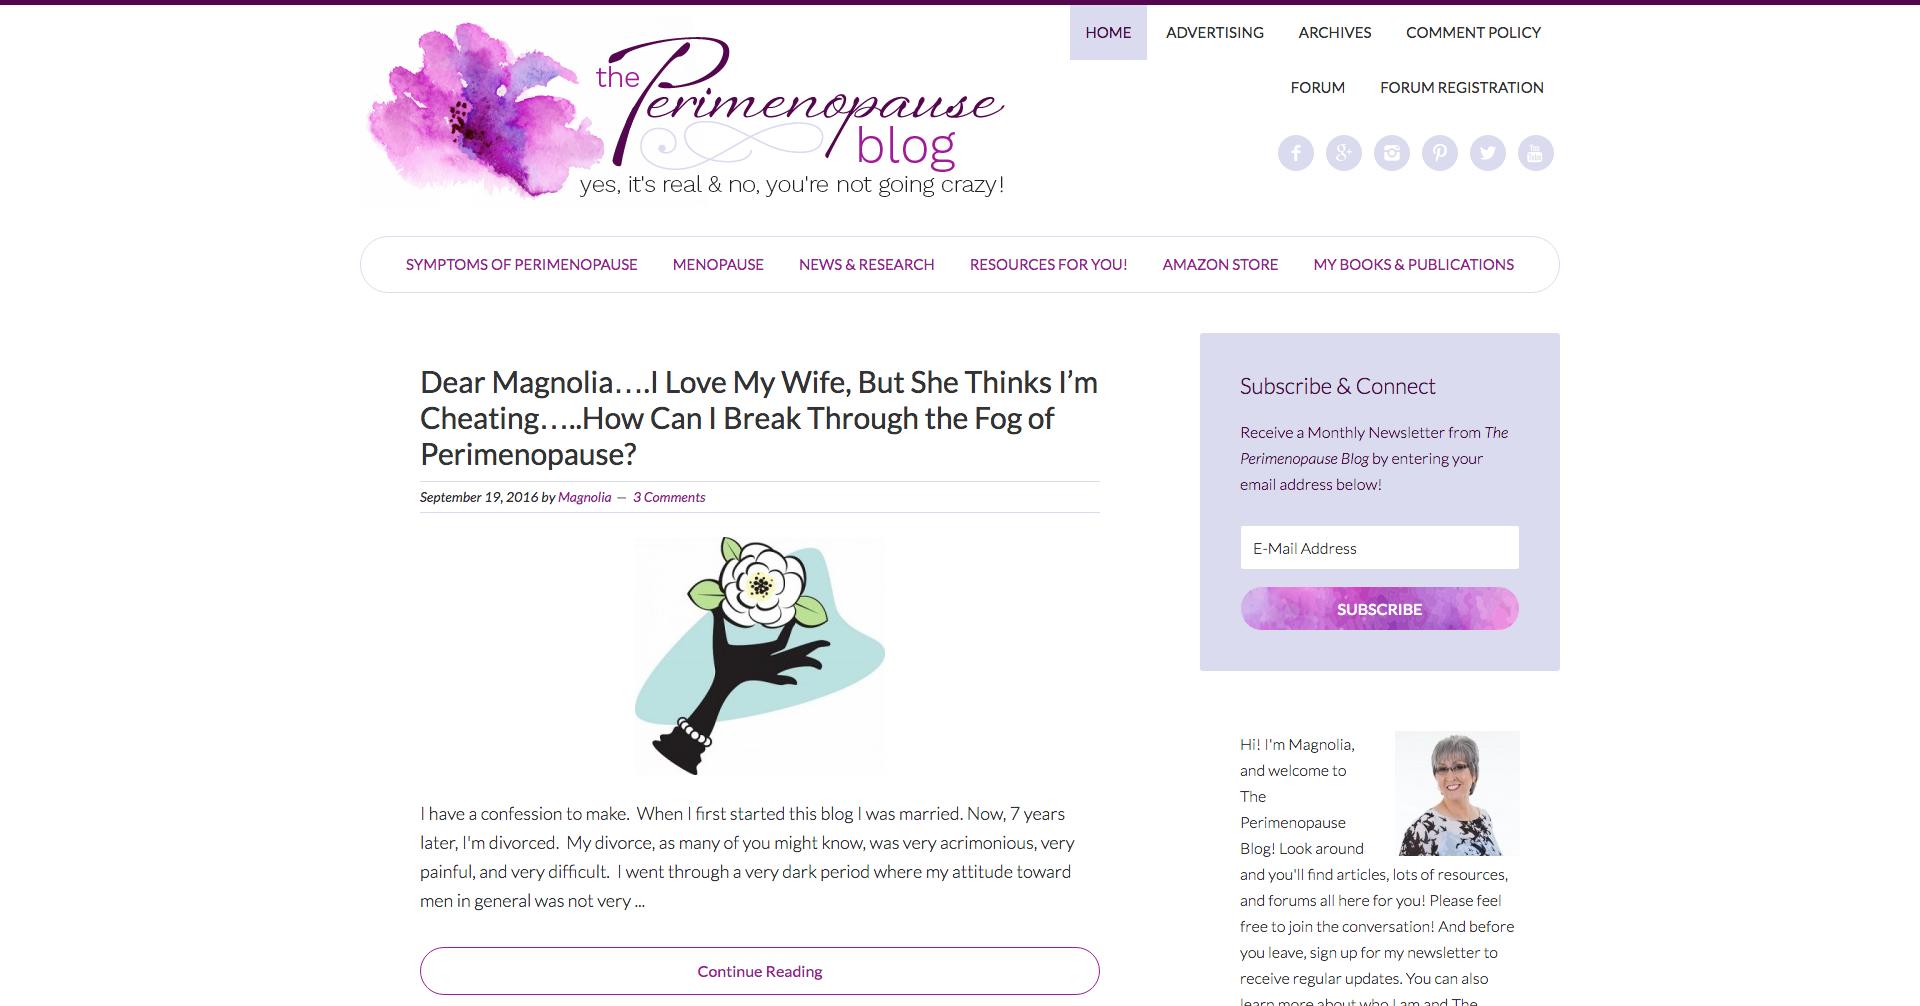 The Perimenopause Blog